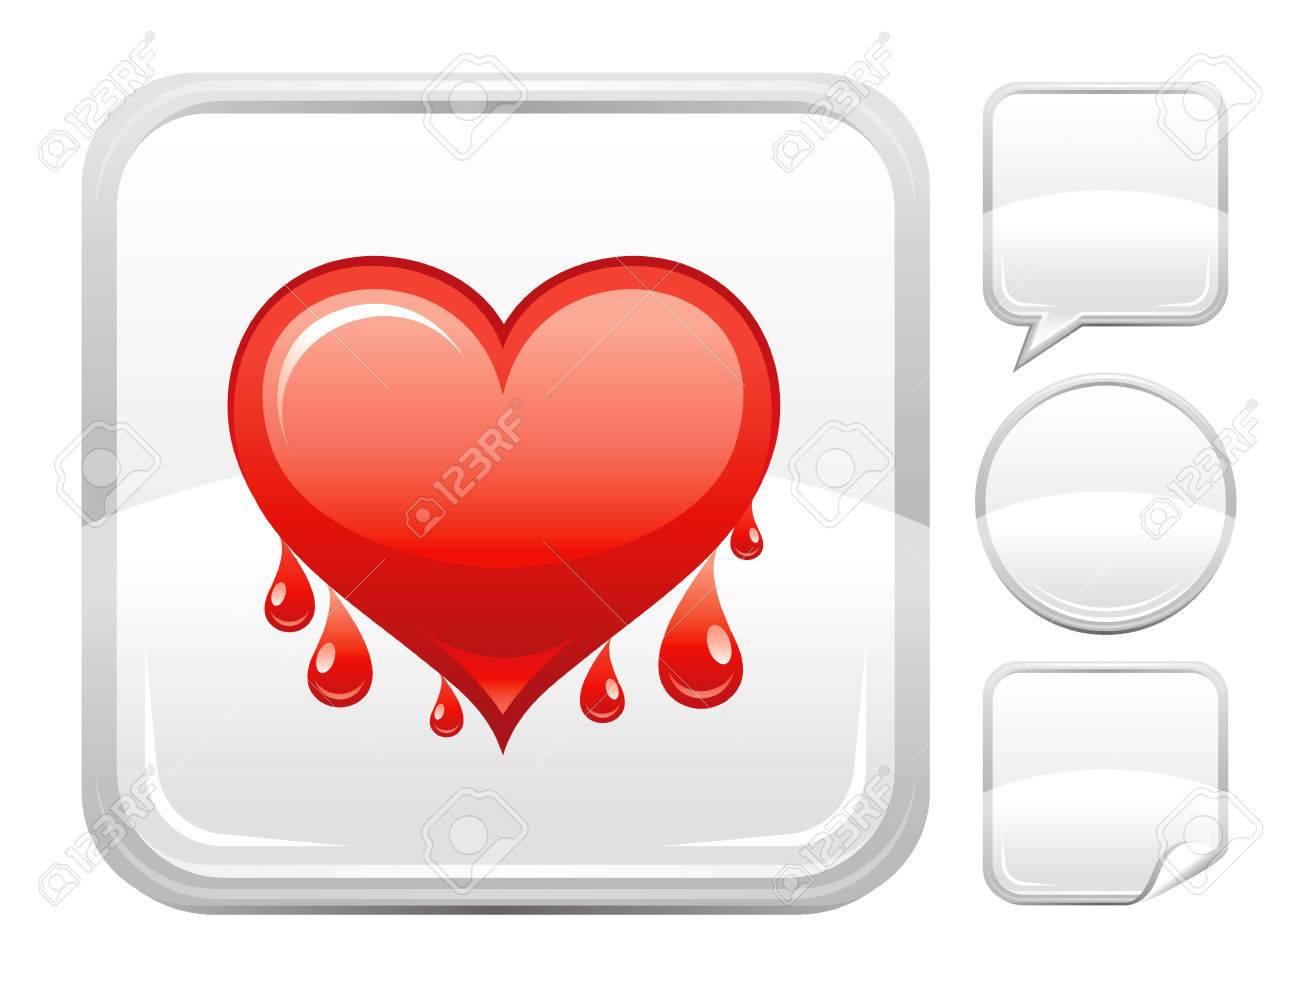 Happy valentines day romance love heart bleeding heart icon happy valentines day romance love heart bleeding heart icon isolated on white background romantic buycottarizona